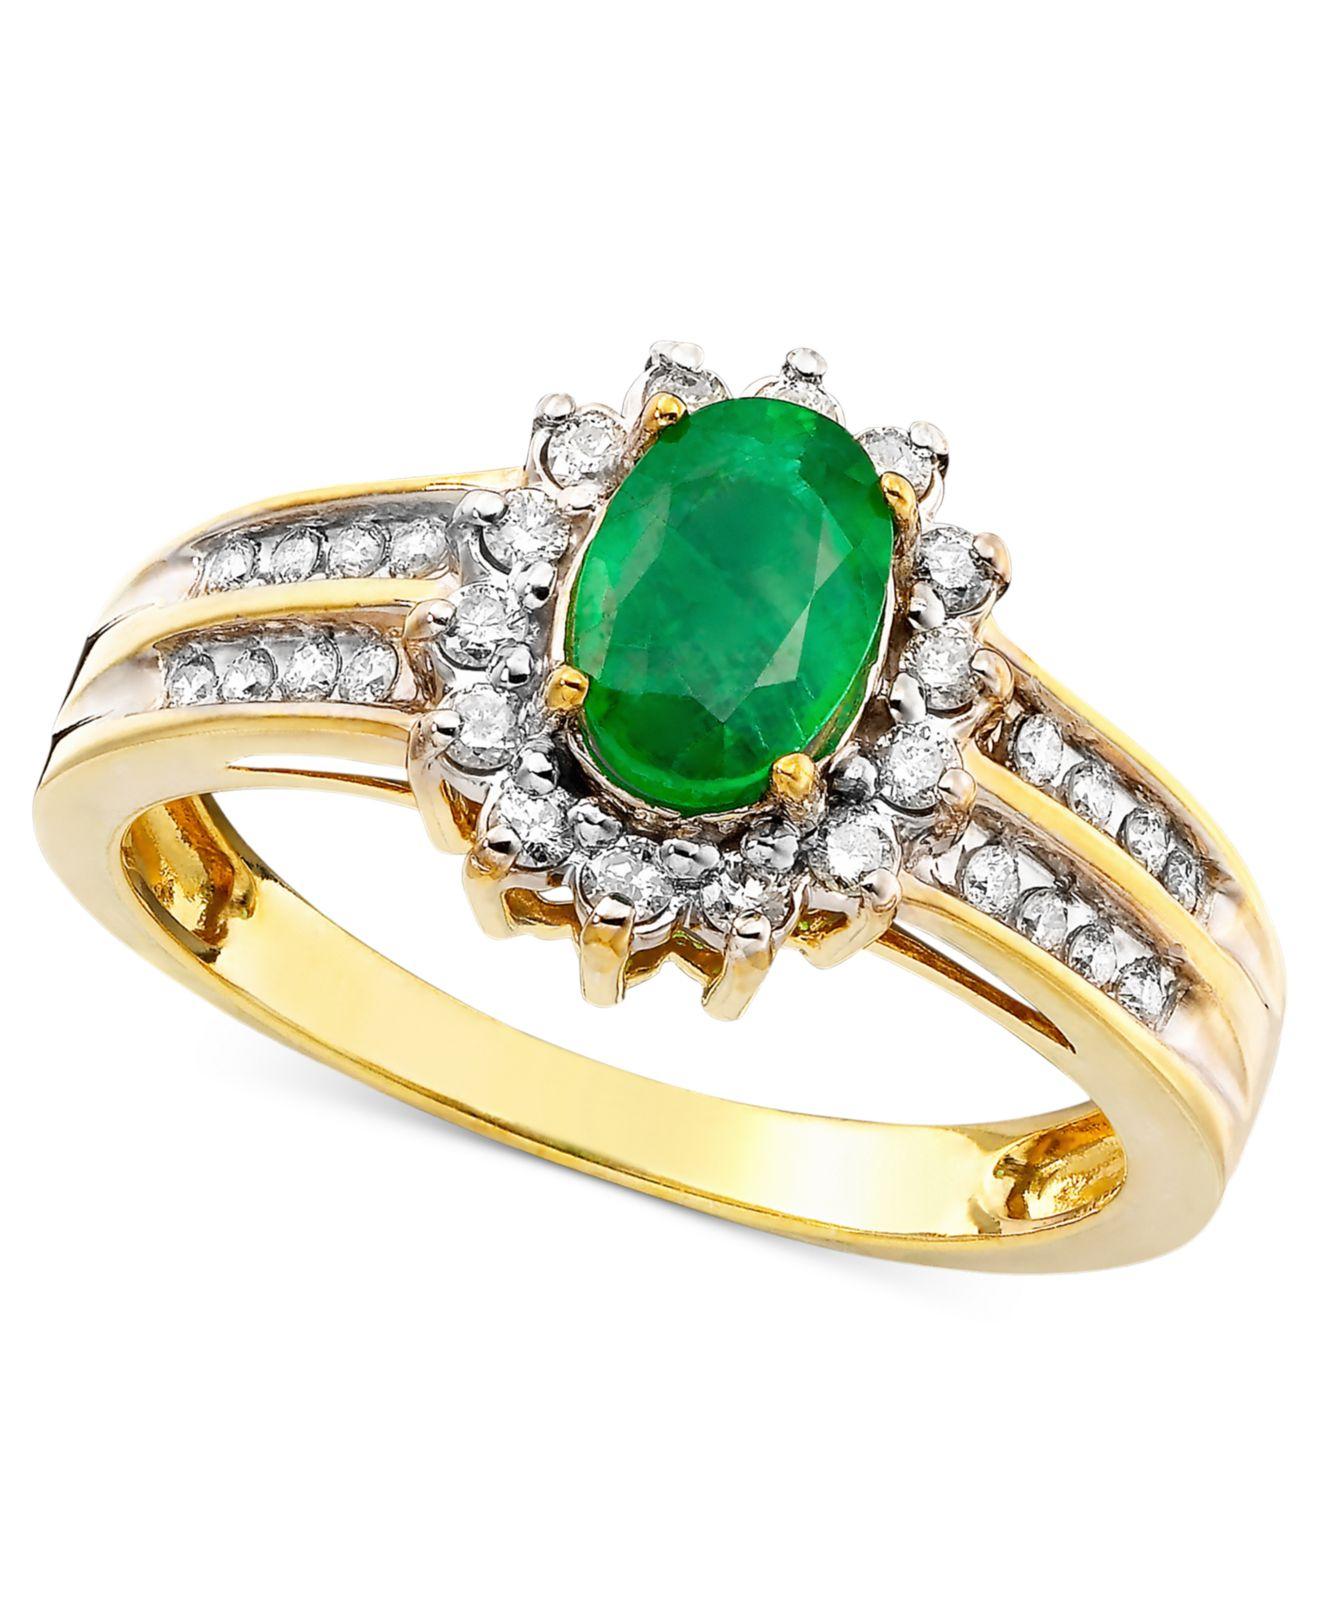 macy s emerald 3 4 ct t w and 3 8 ct t w